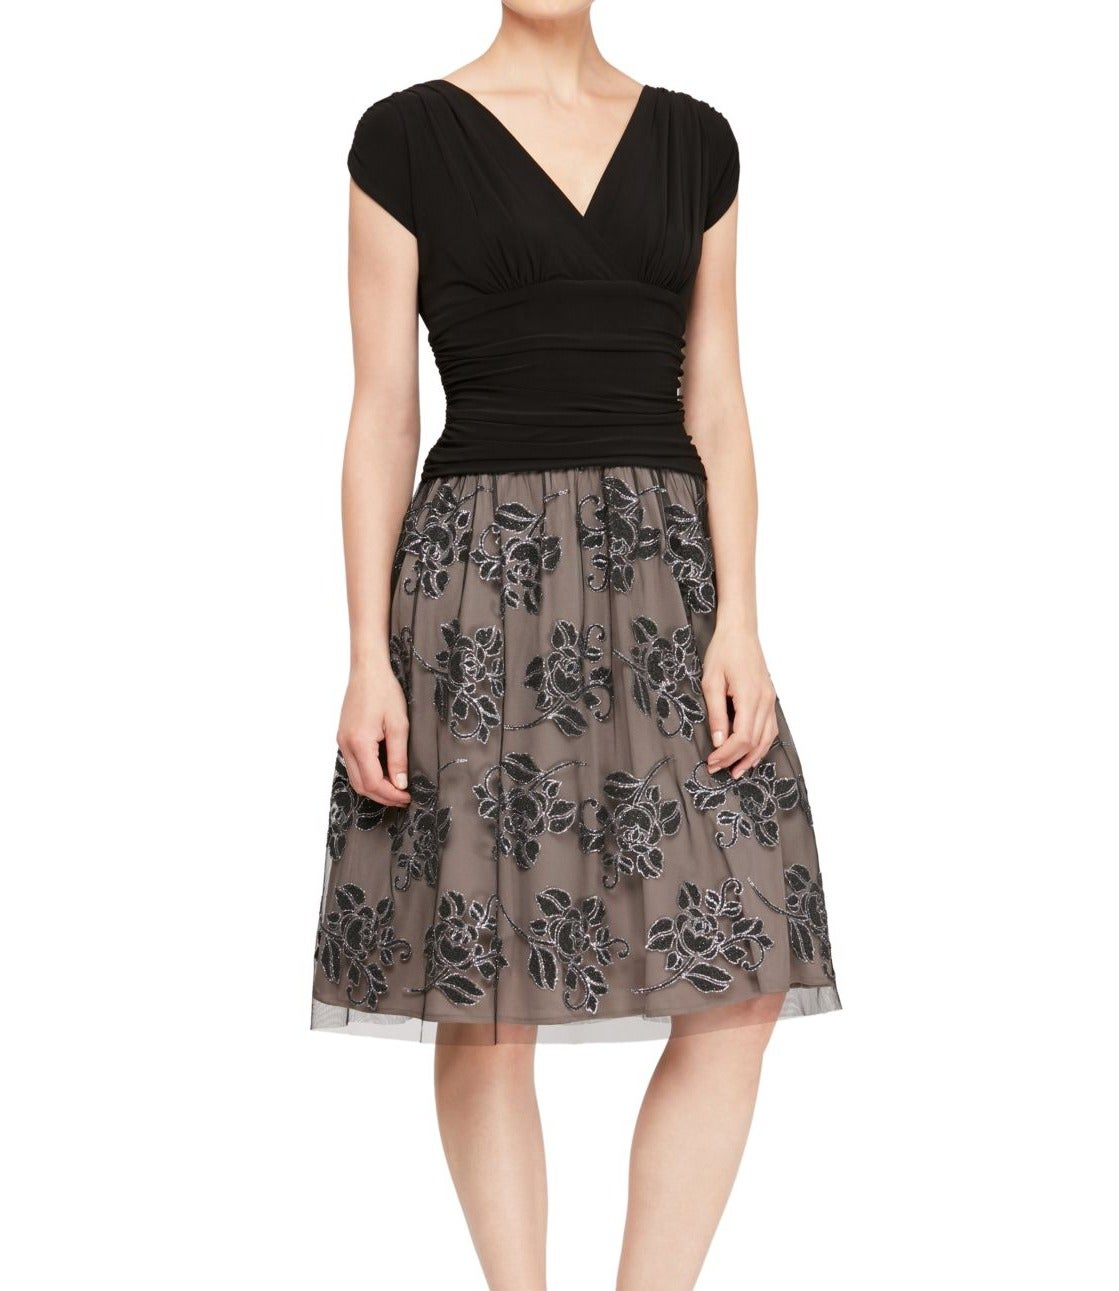 SLNY Women's Dress Black Size 8 A-Line Jersey Top Metallic Mesh Skirt